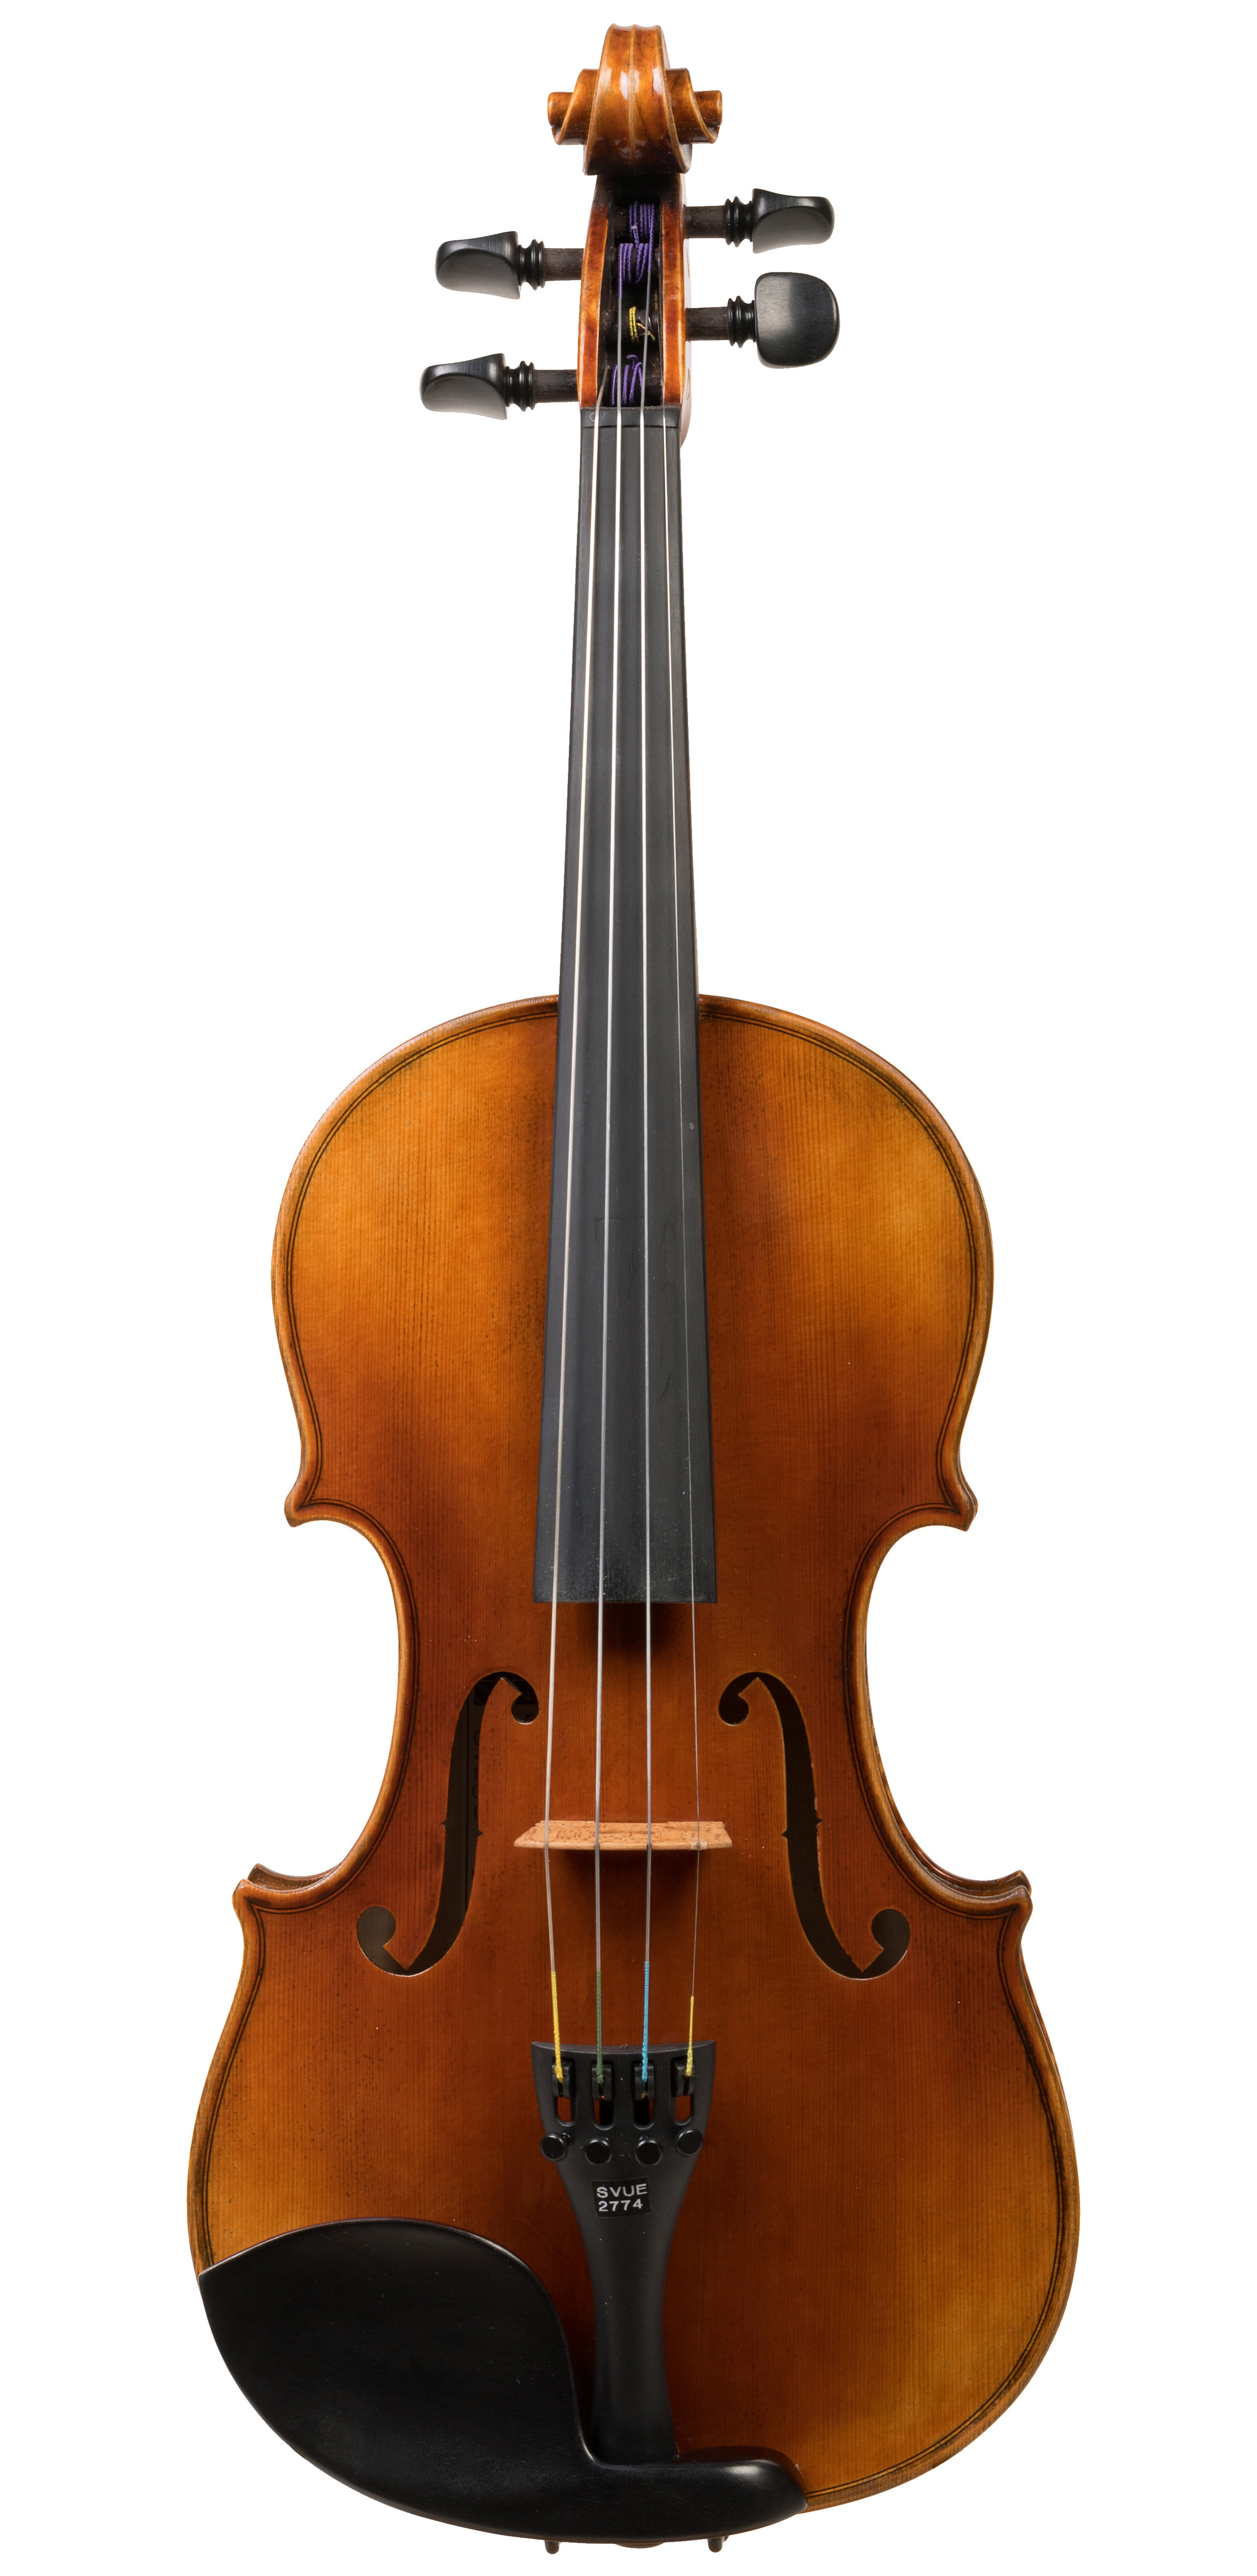 Seman Violins SV250 -